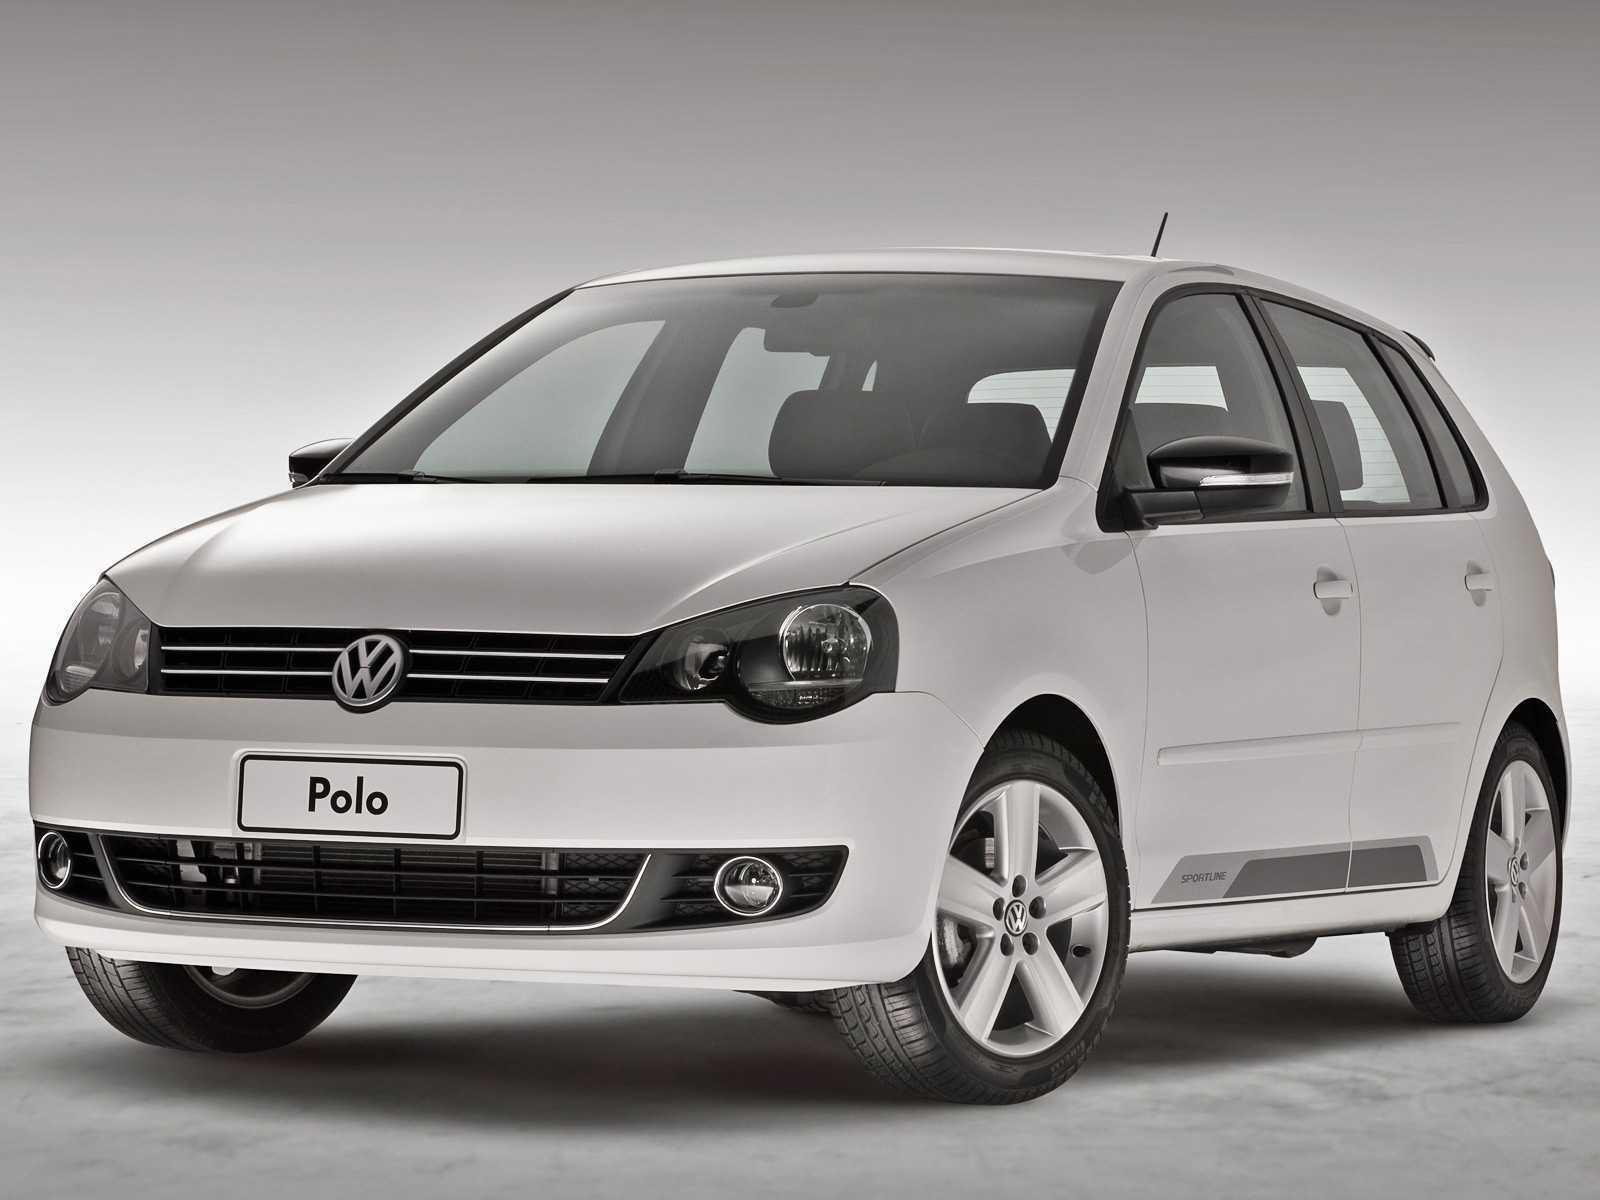 VolkswagenPolo 2014 - ângulo frontal